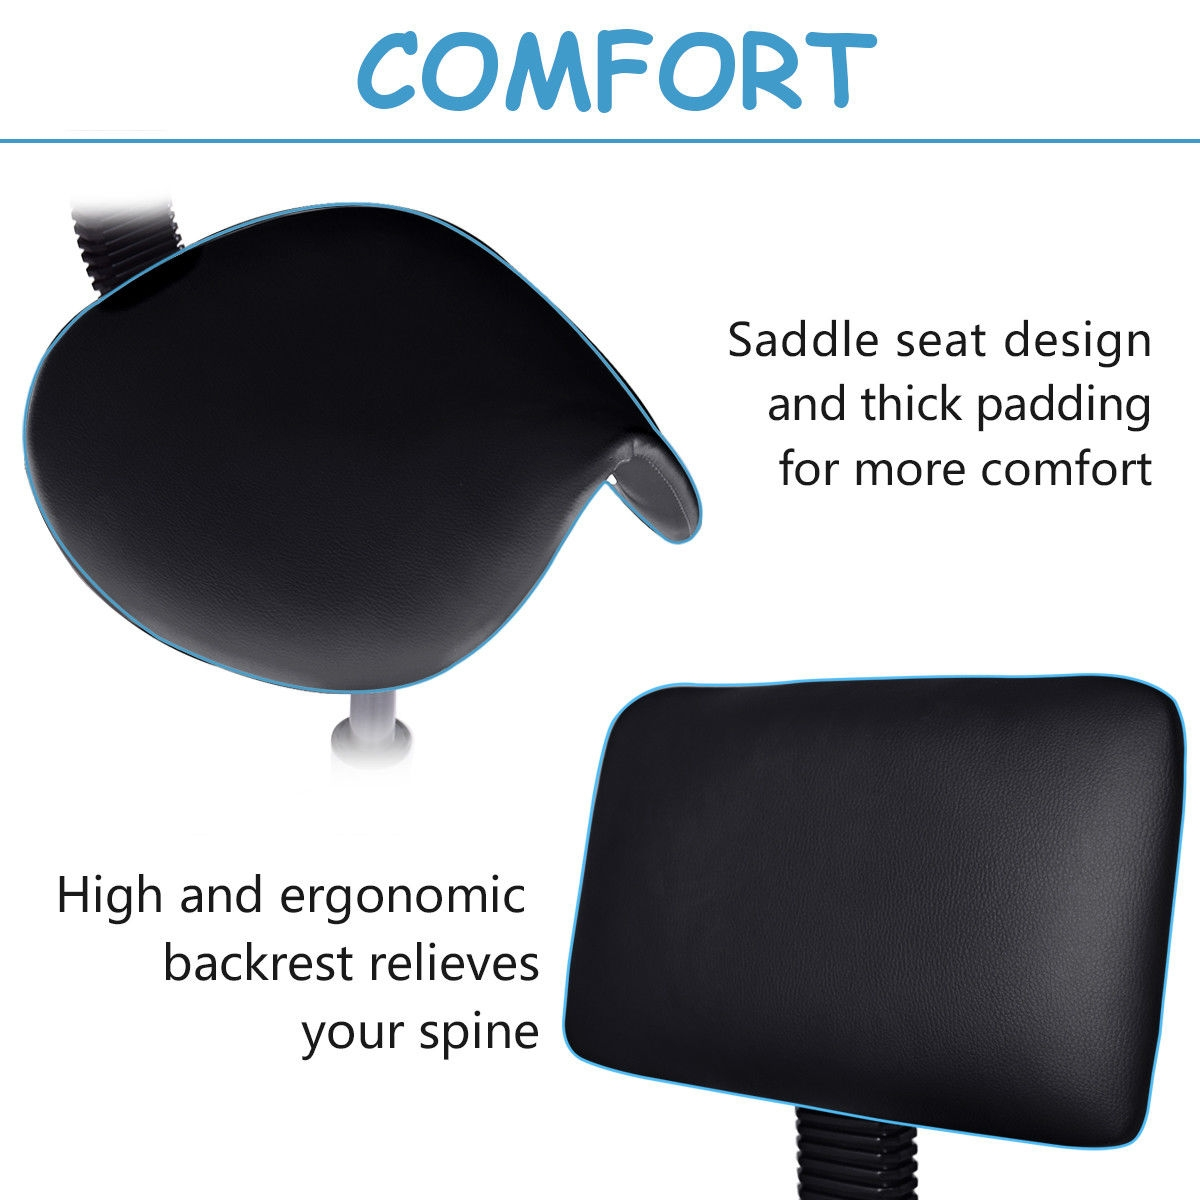 Adjustable Saddle Salon Rolling Massage Chair w/ Backrest